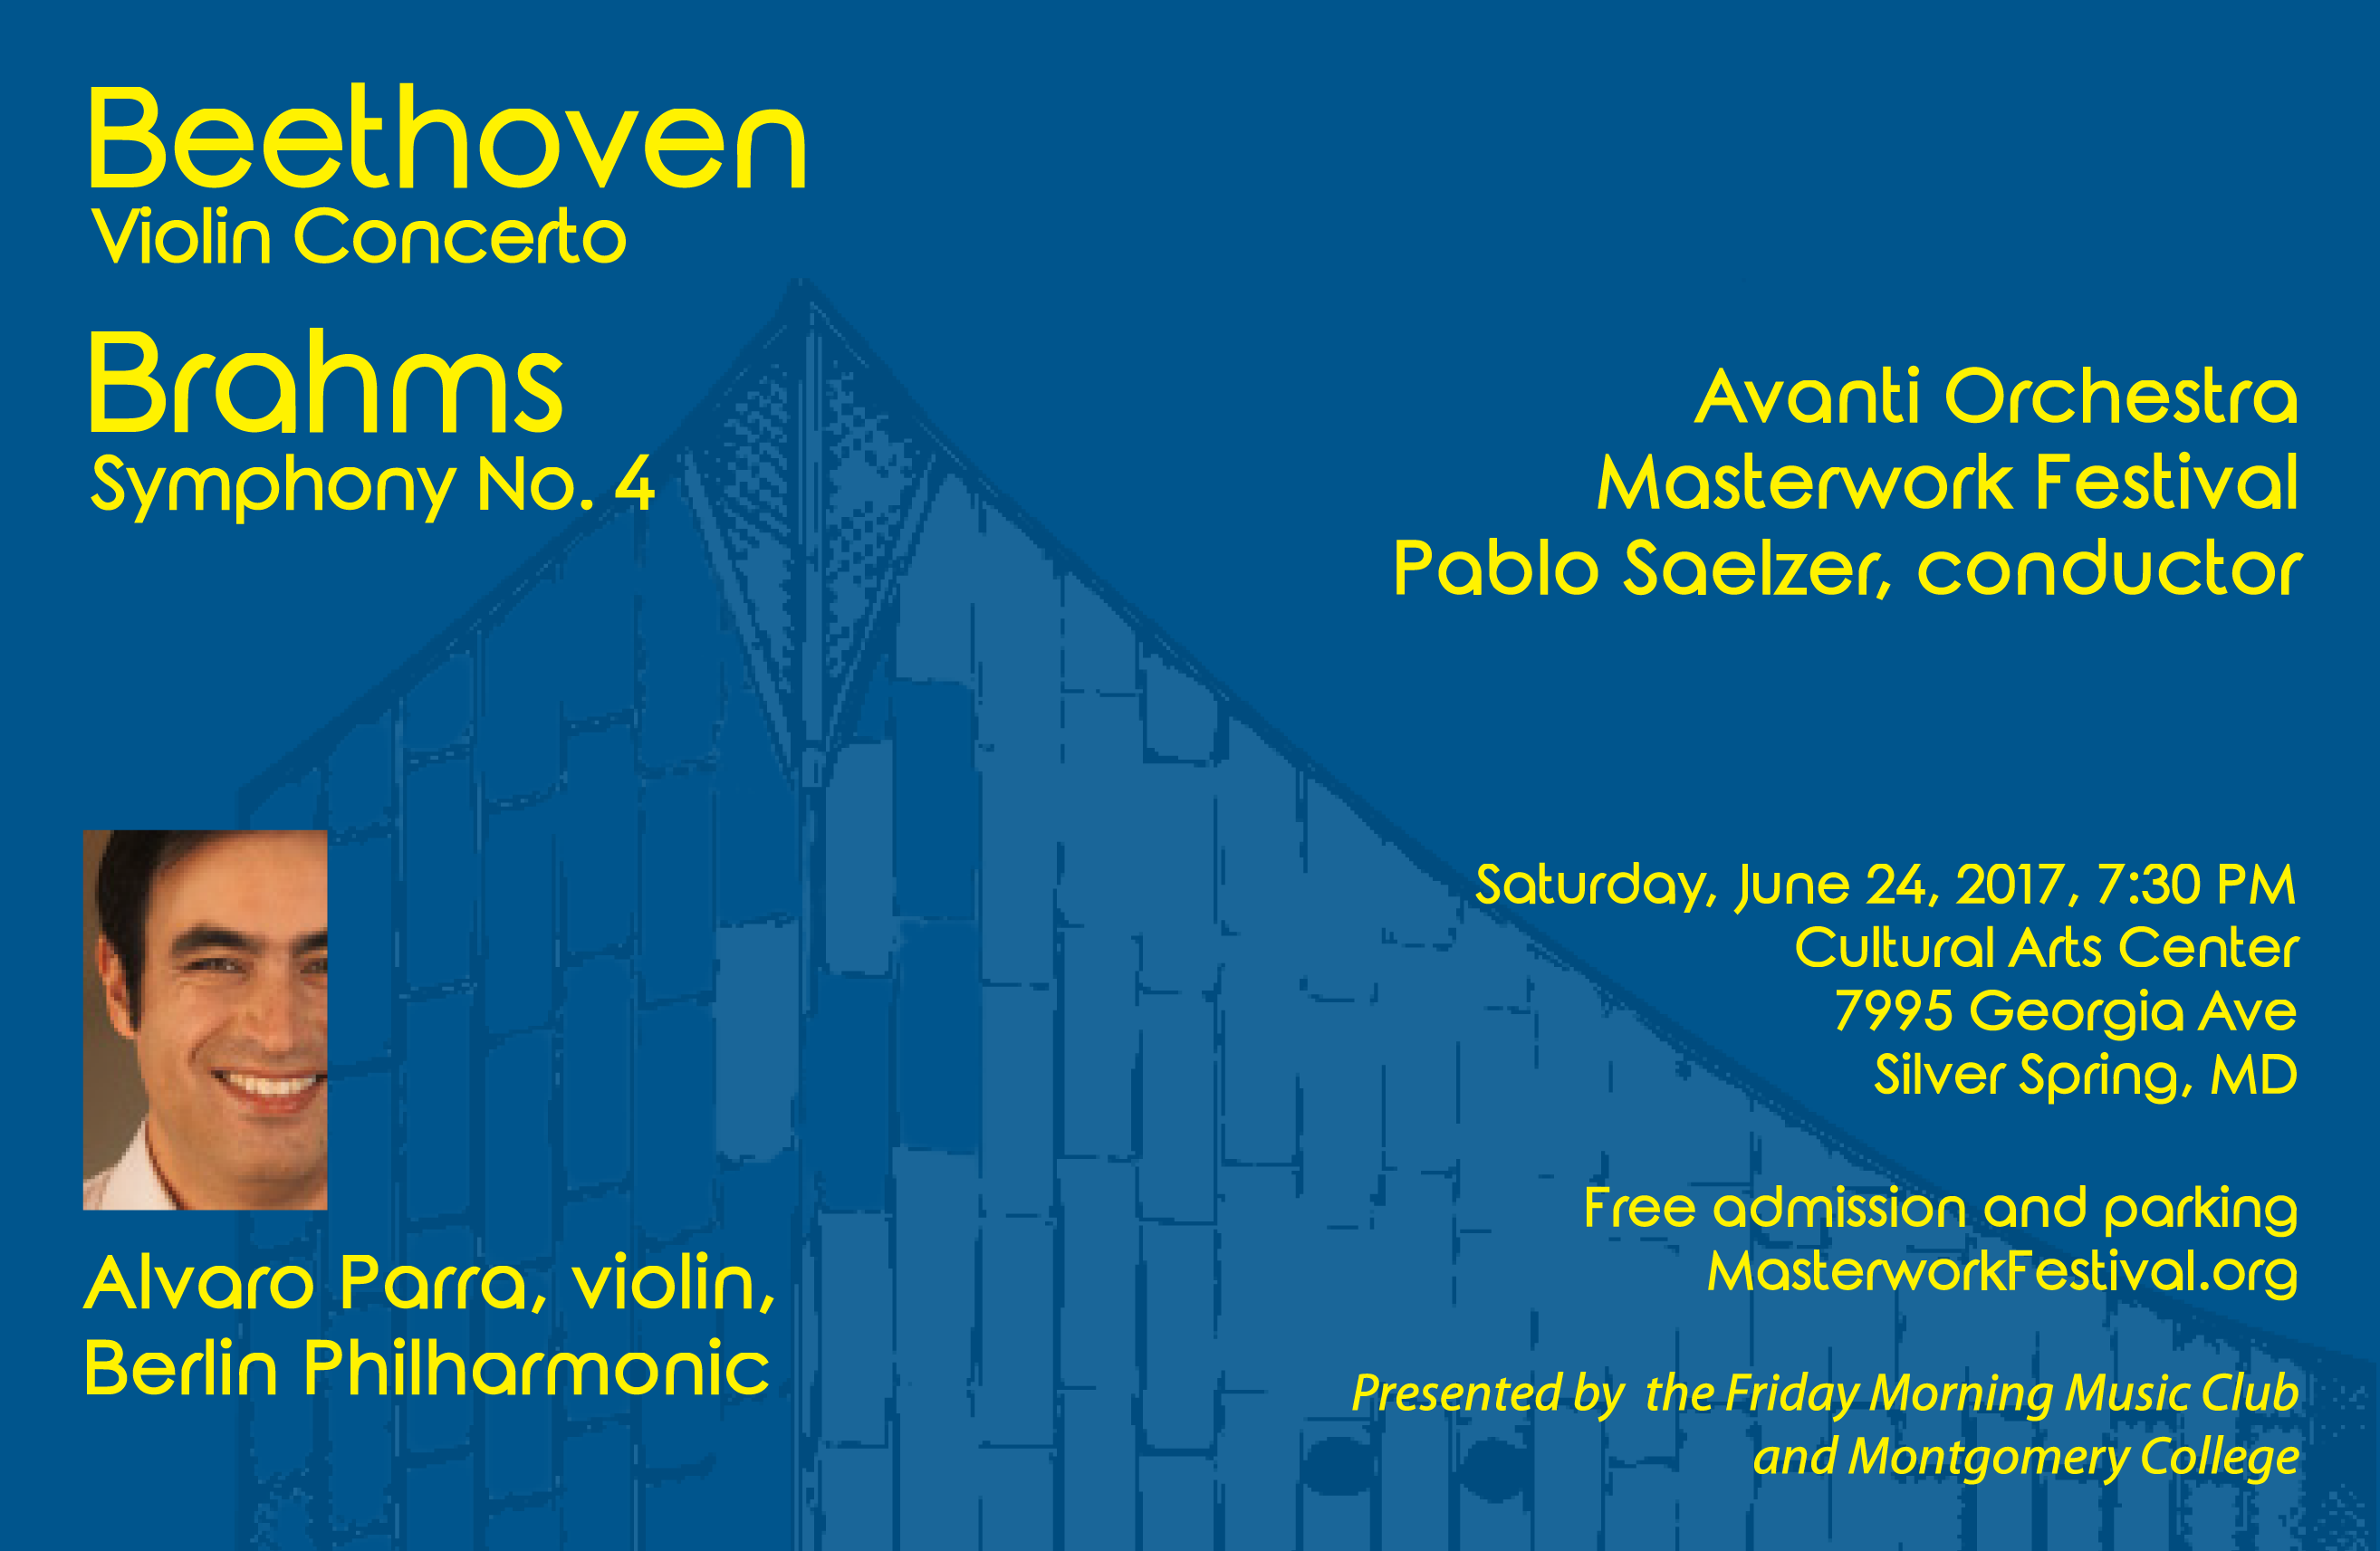 Avanti Orchestra